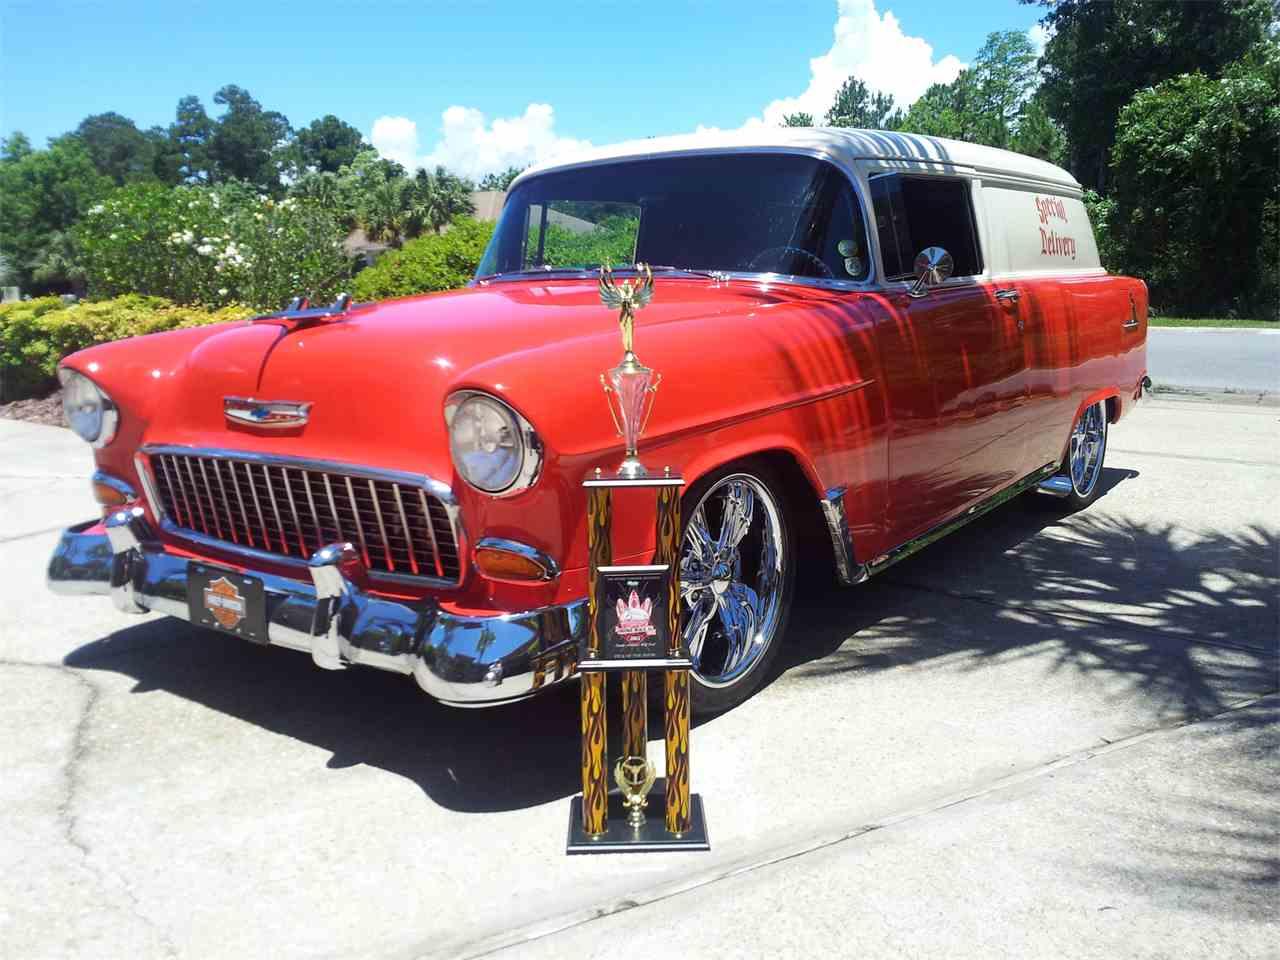 1955 Chevrolet Sedan Delivery for Sale - CC-996554